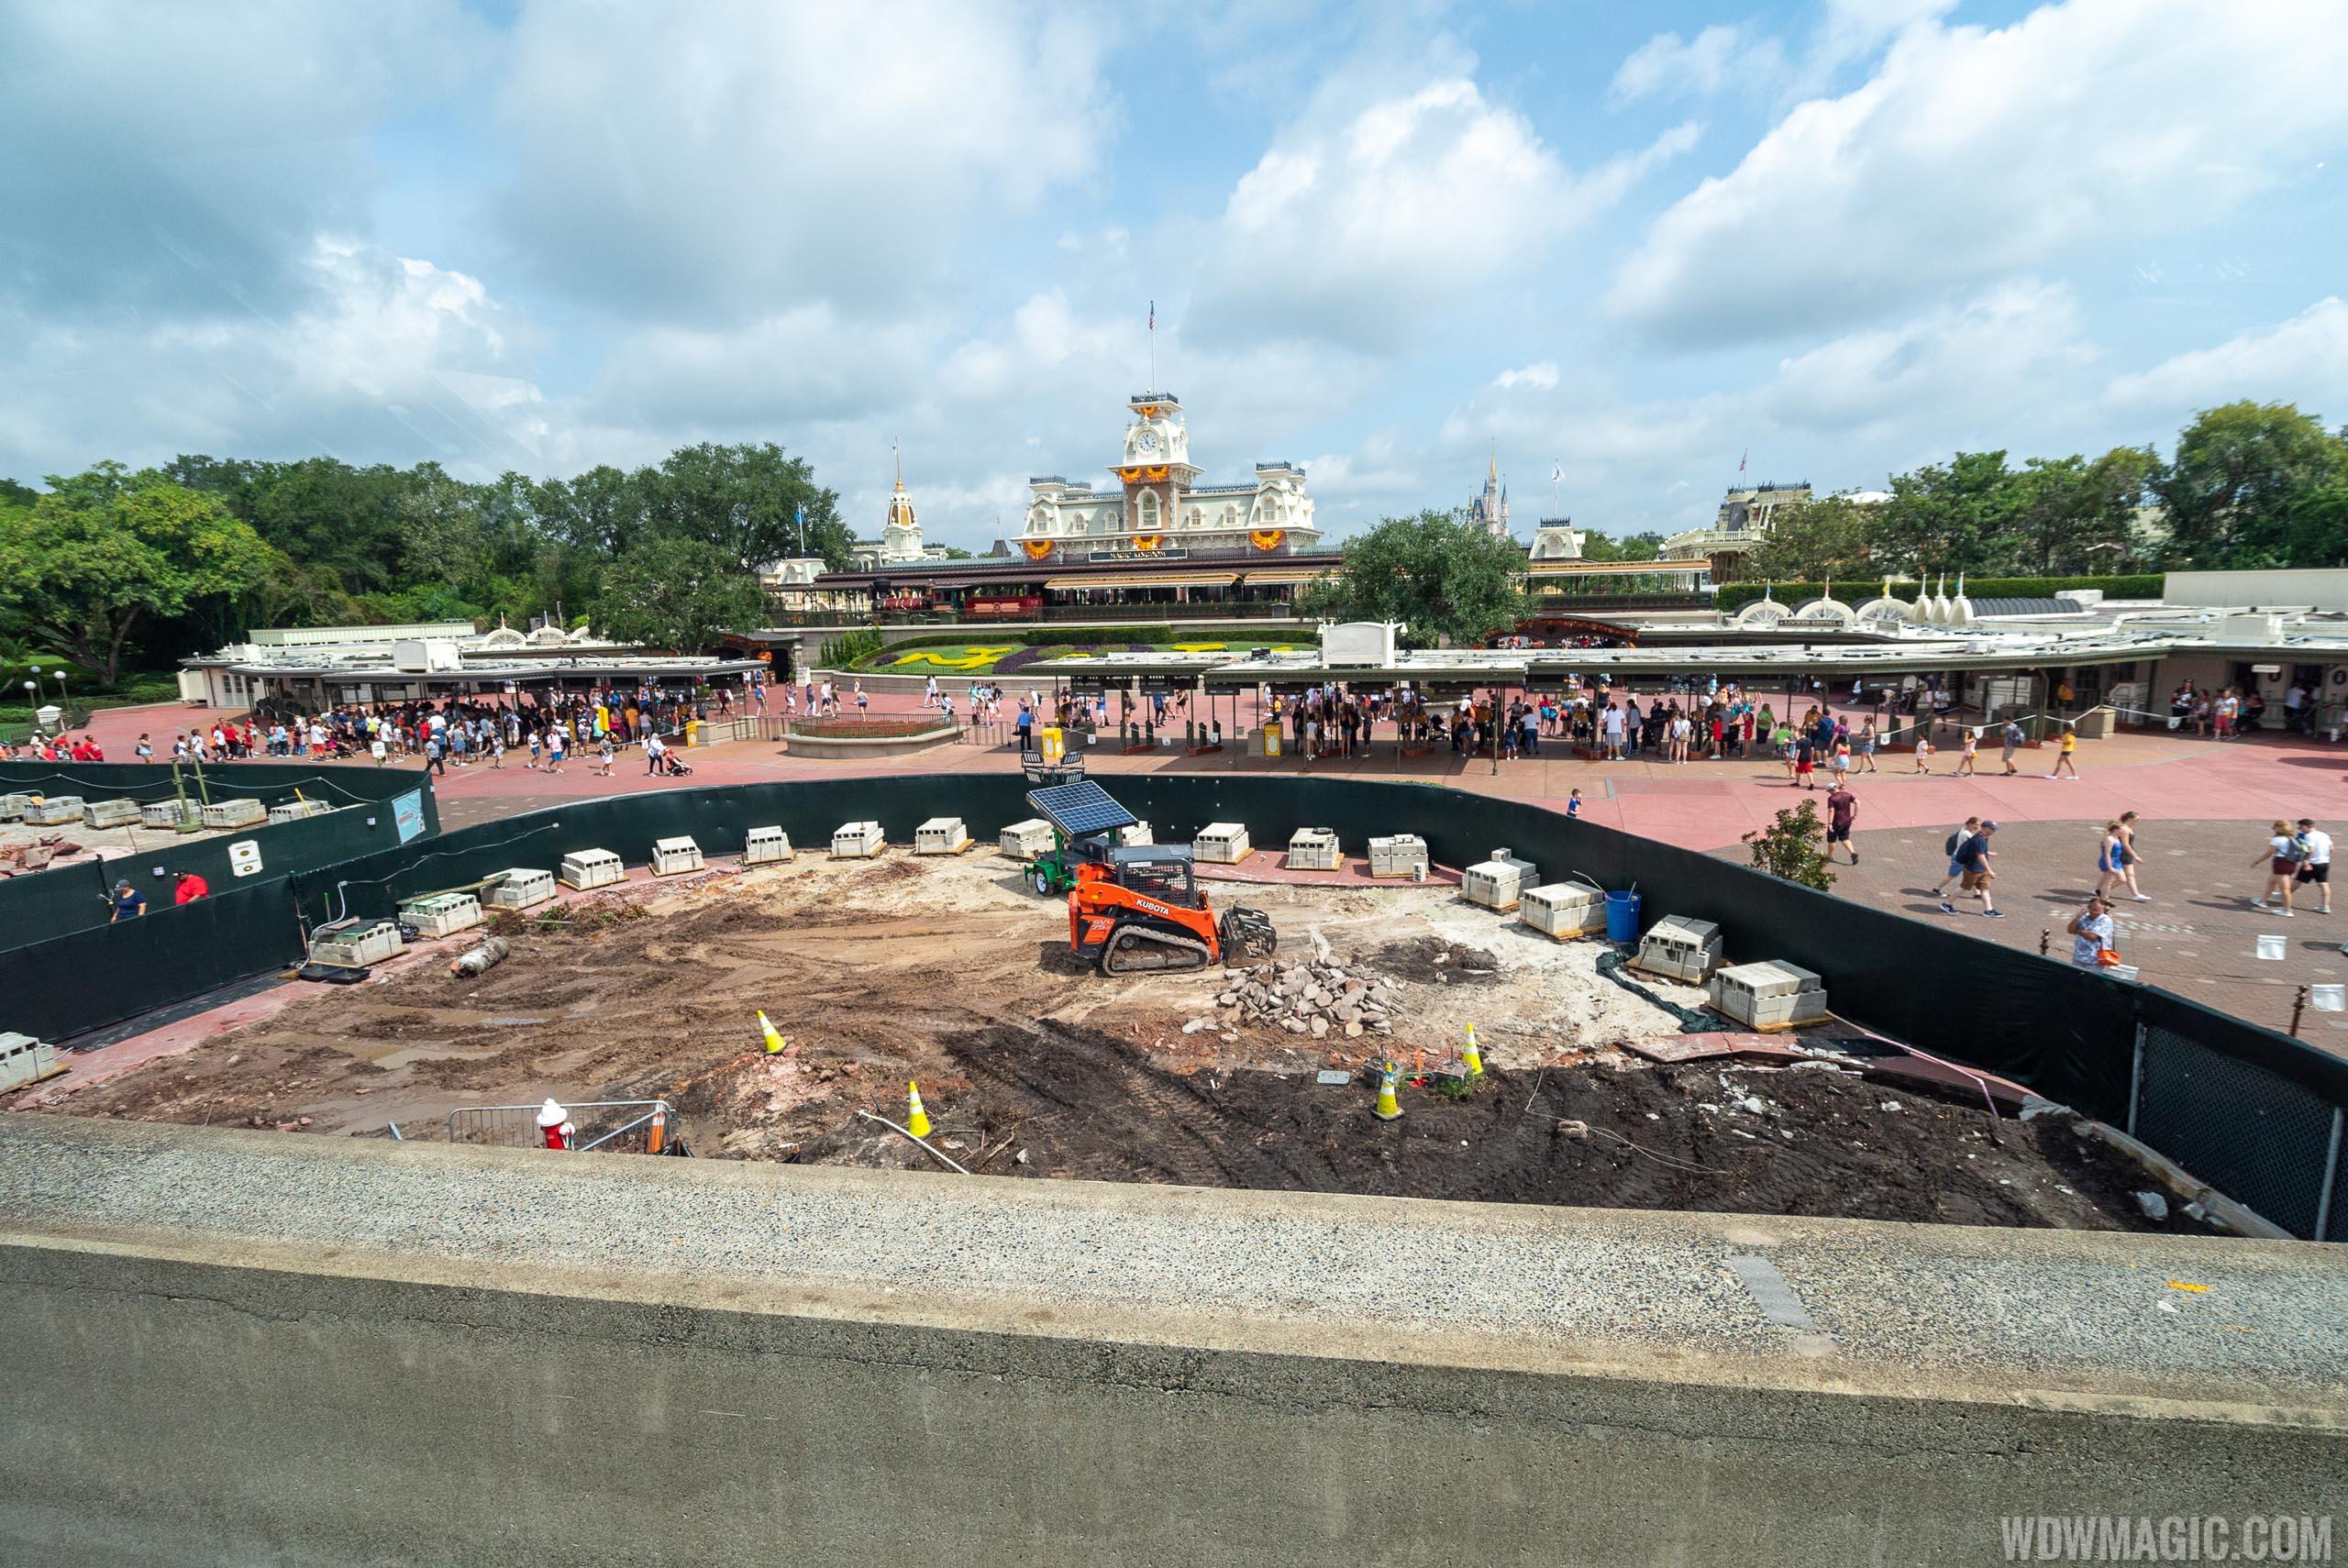 Magic Kingdom main entrance area construction - August 2019